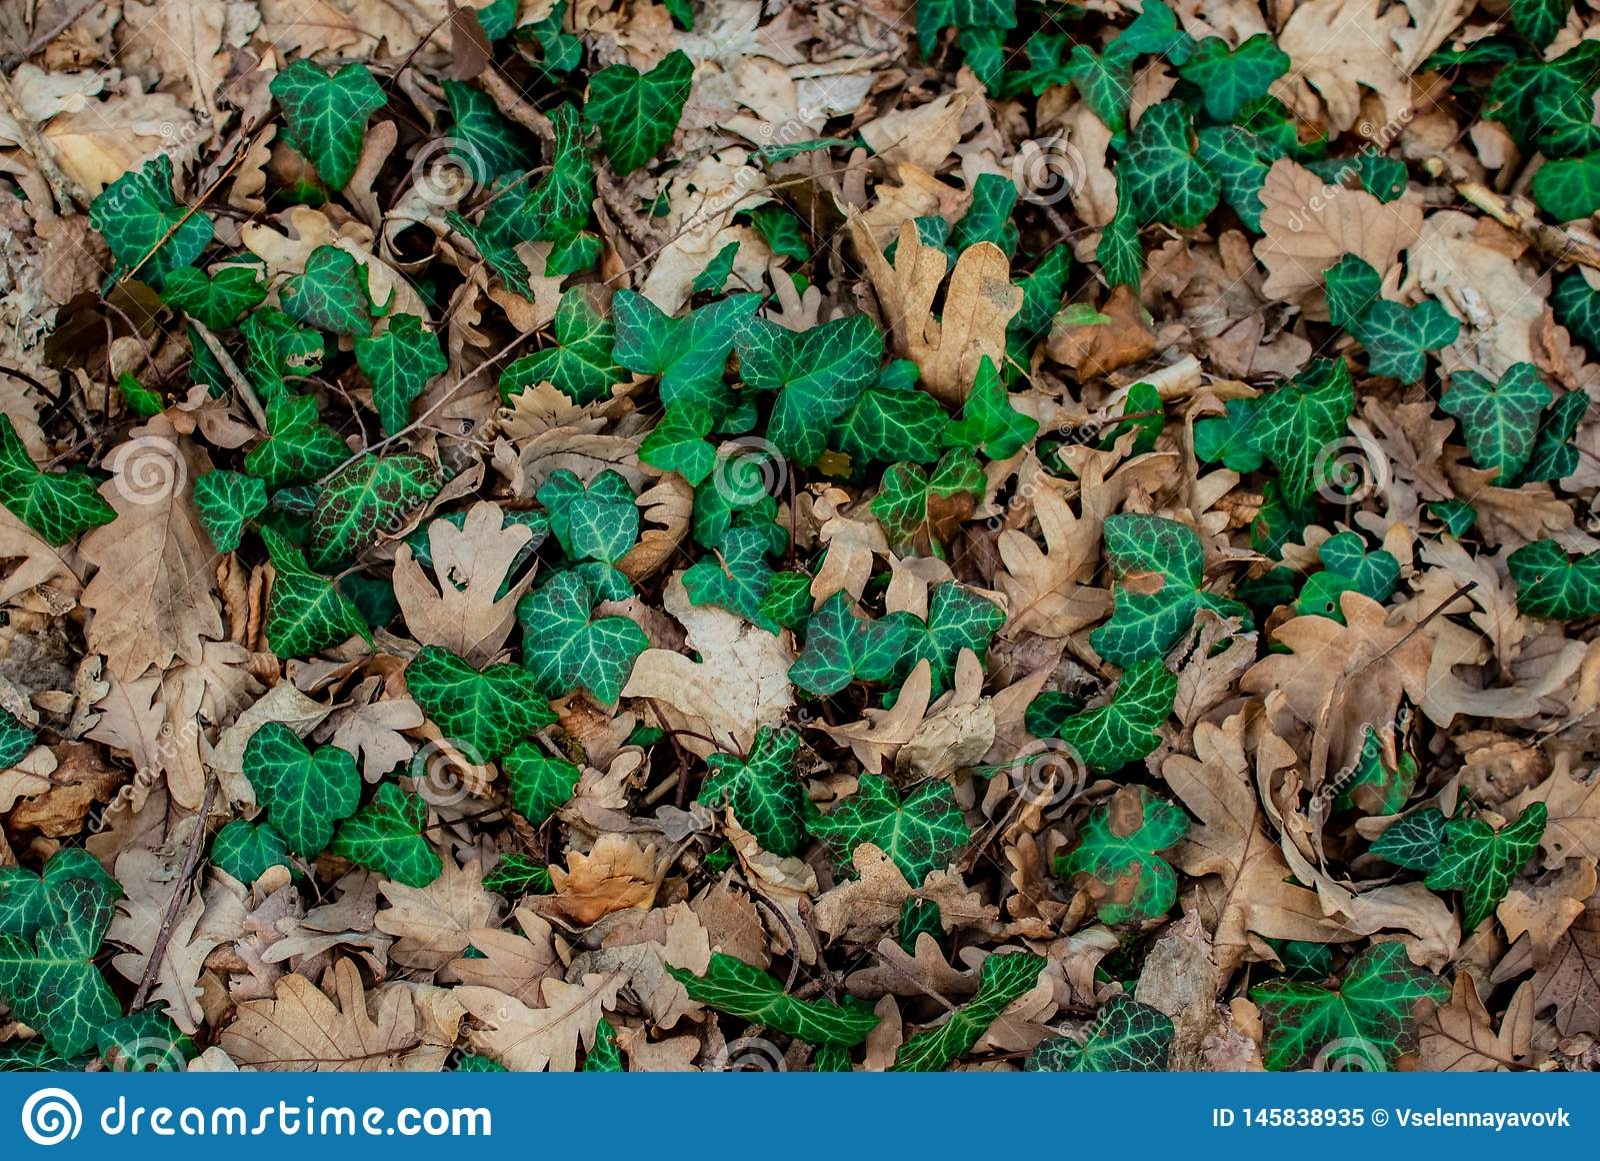 Green Leaf Liana in Dry Oak Leaves